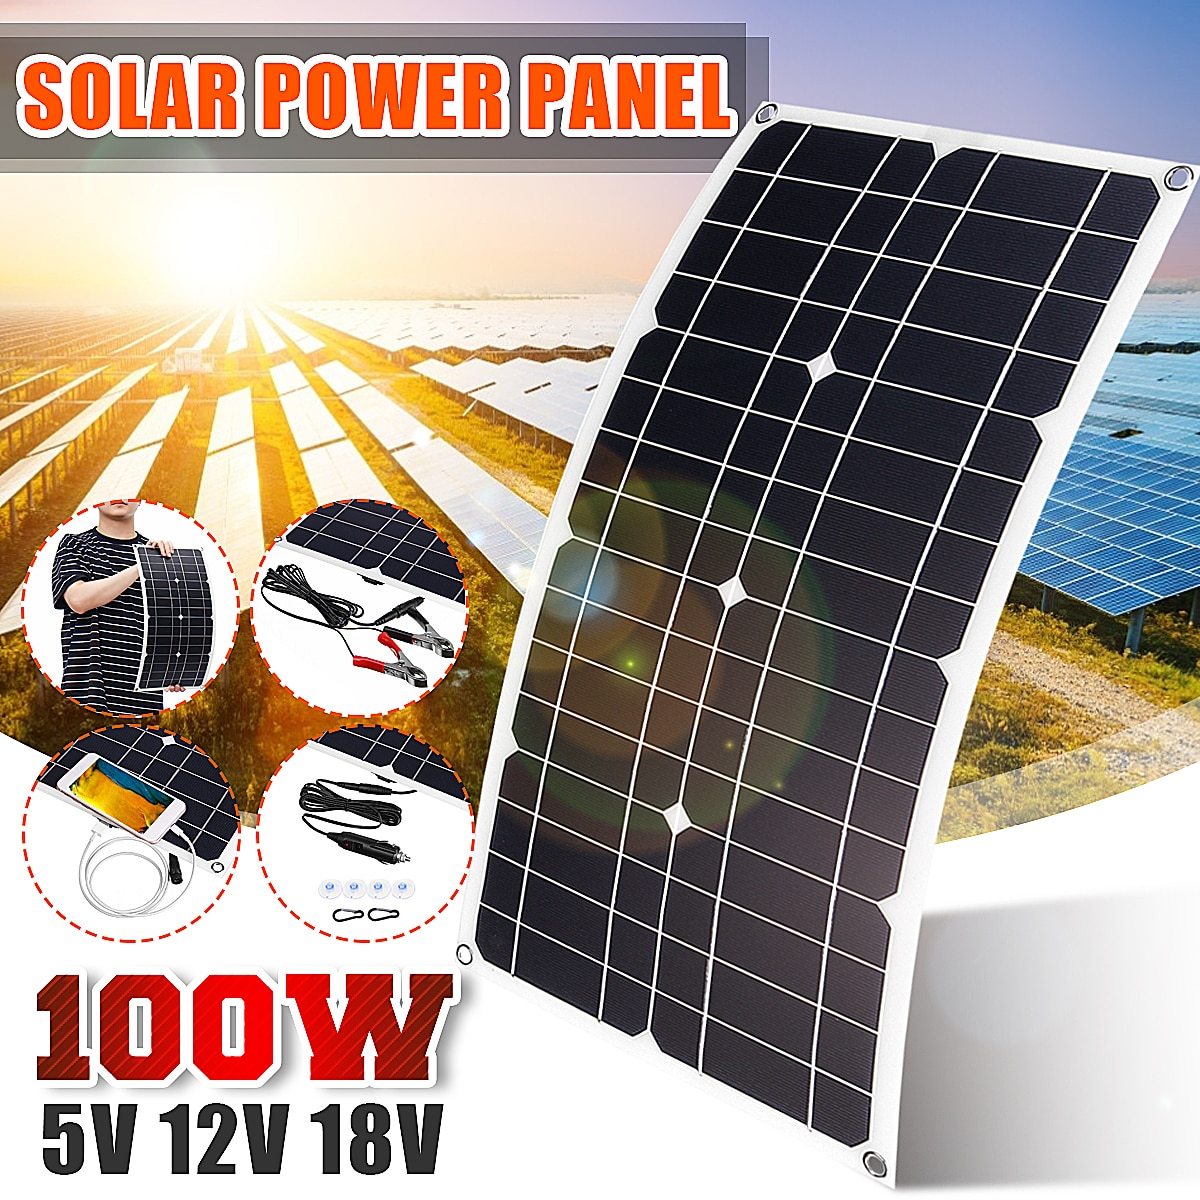 100W الشمسية لوحة USB 5V DC 12V مع 10/20/30A تحكم مرنة الخلايا الشمسية ل سيارة يخت بطارية شاحن للماء